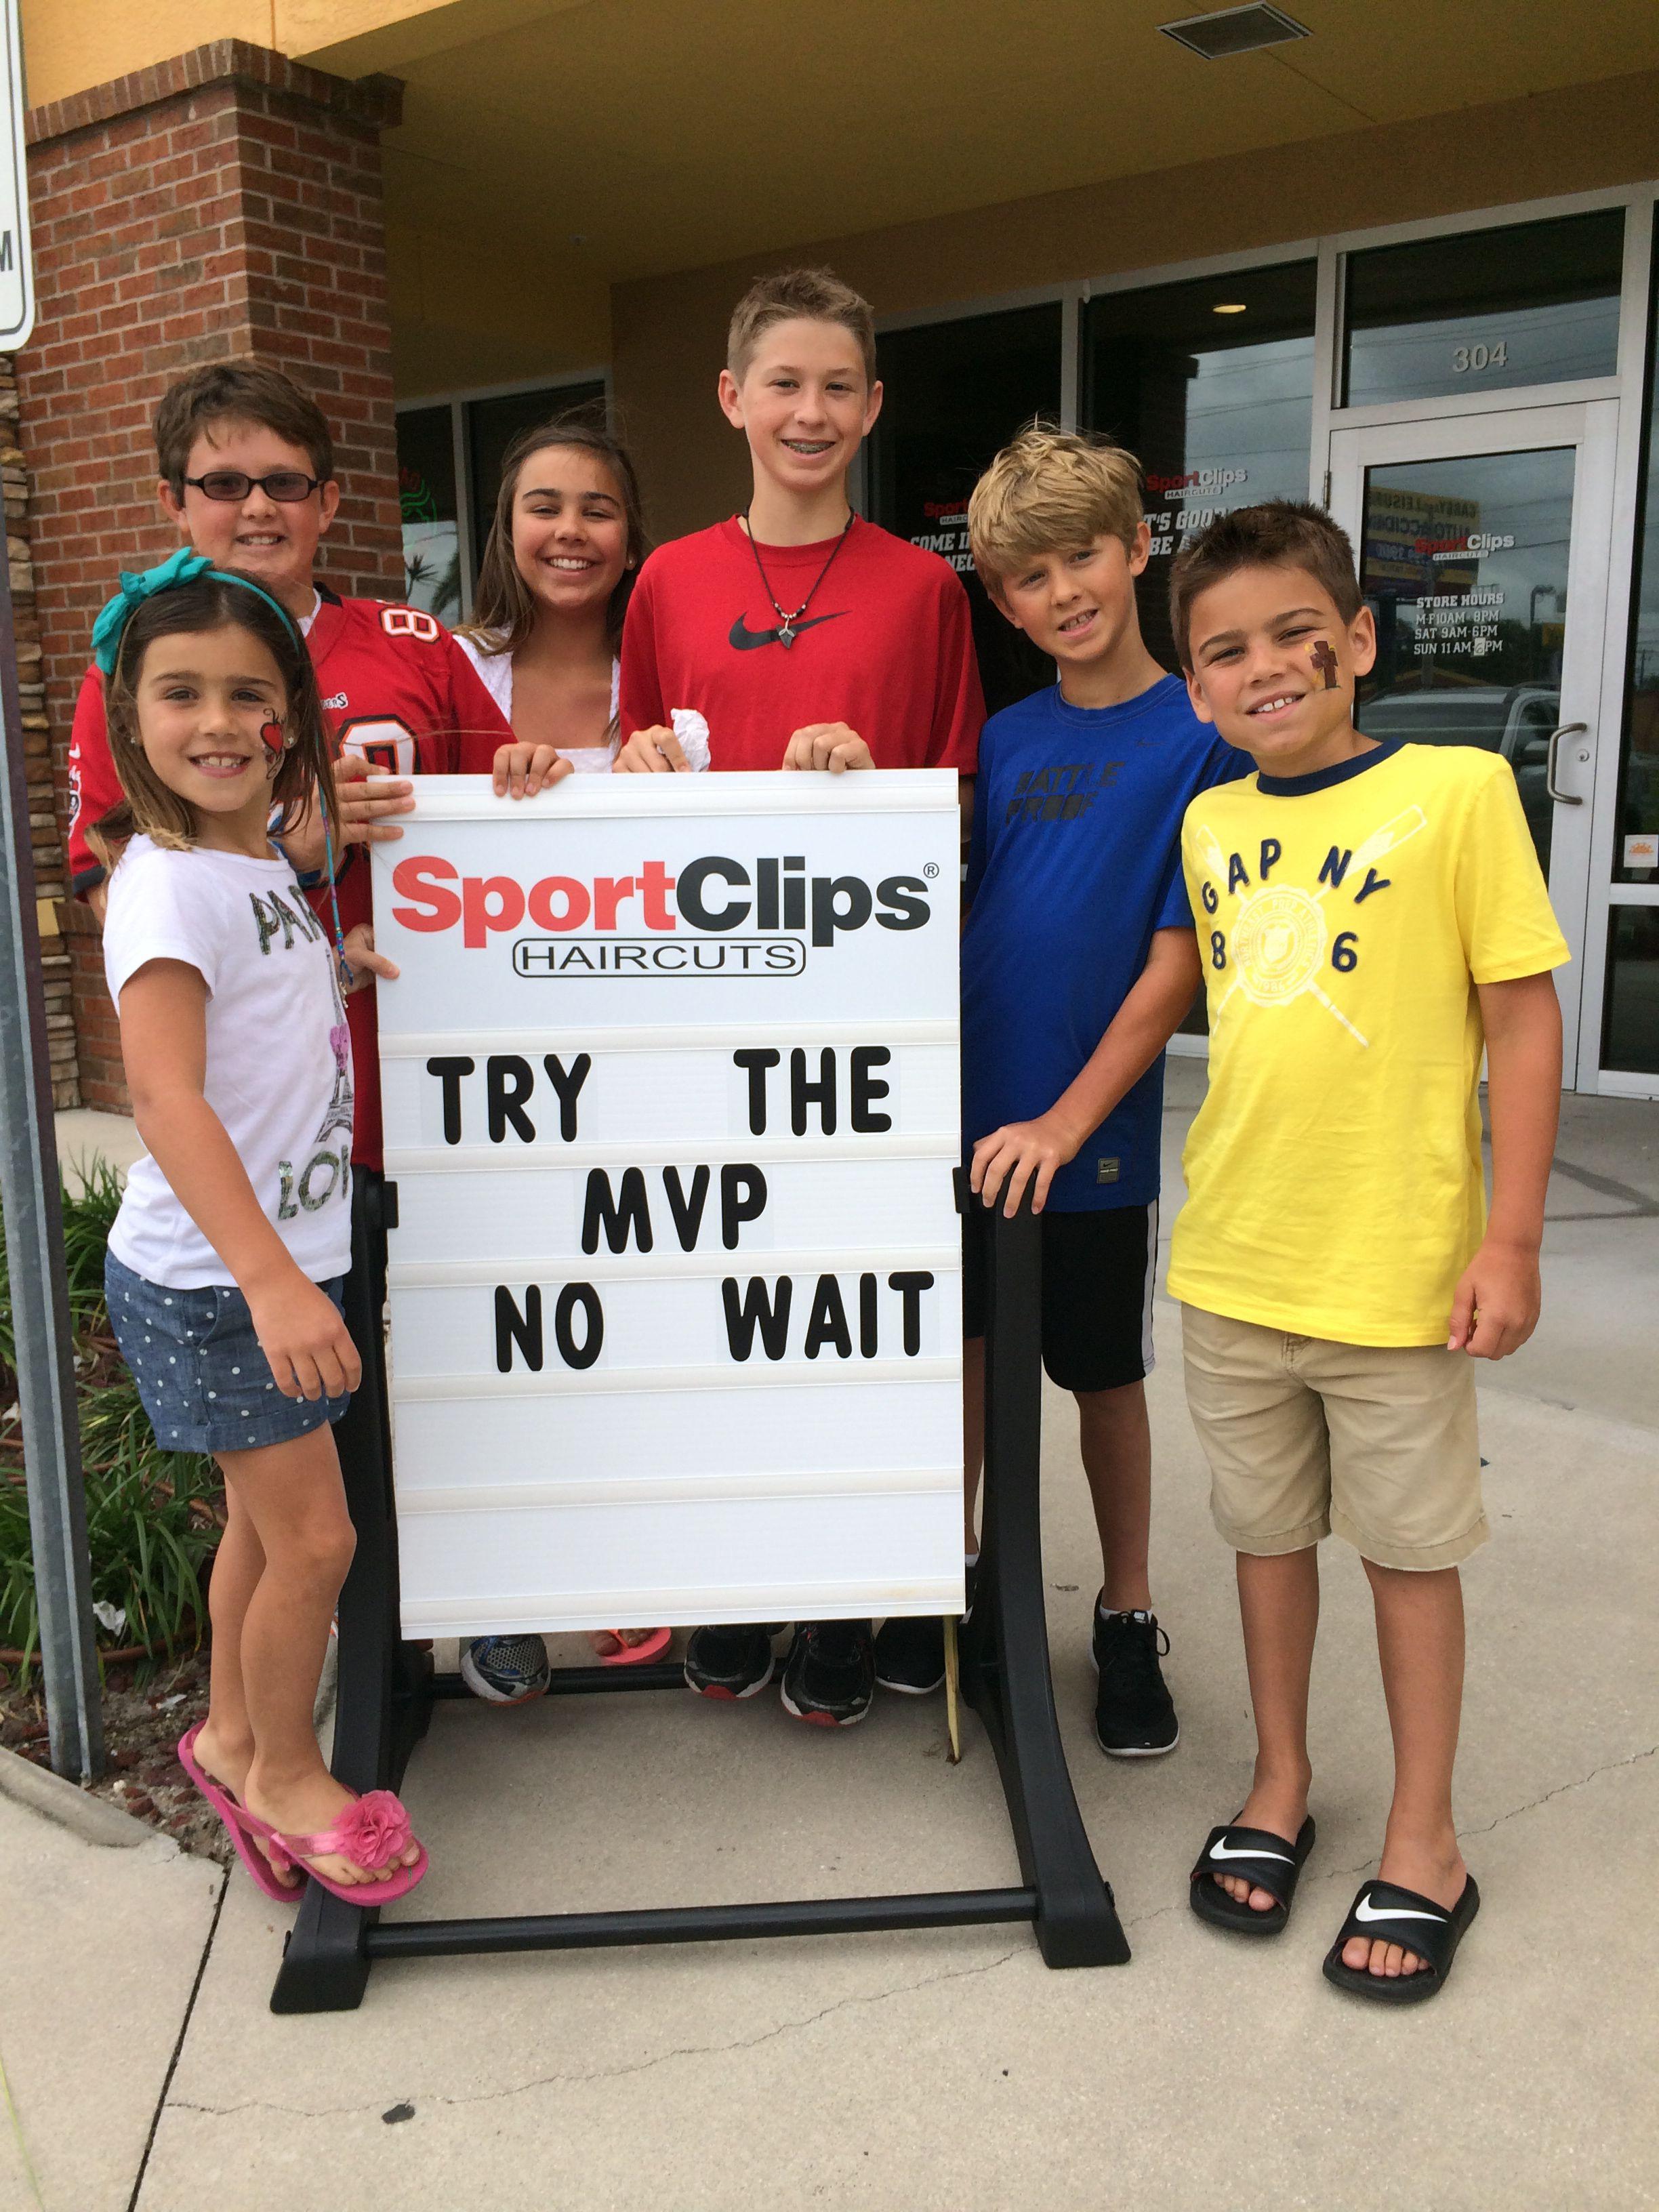 Kids love the MVP at oldsmar Sport Clips Sports clips